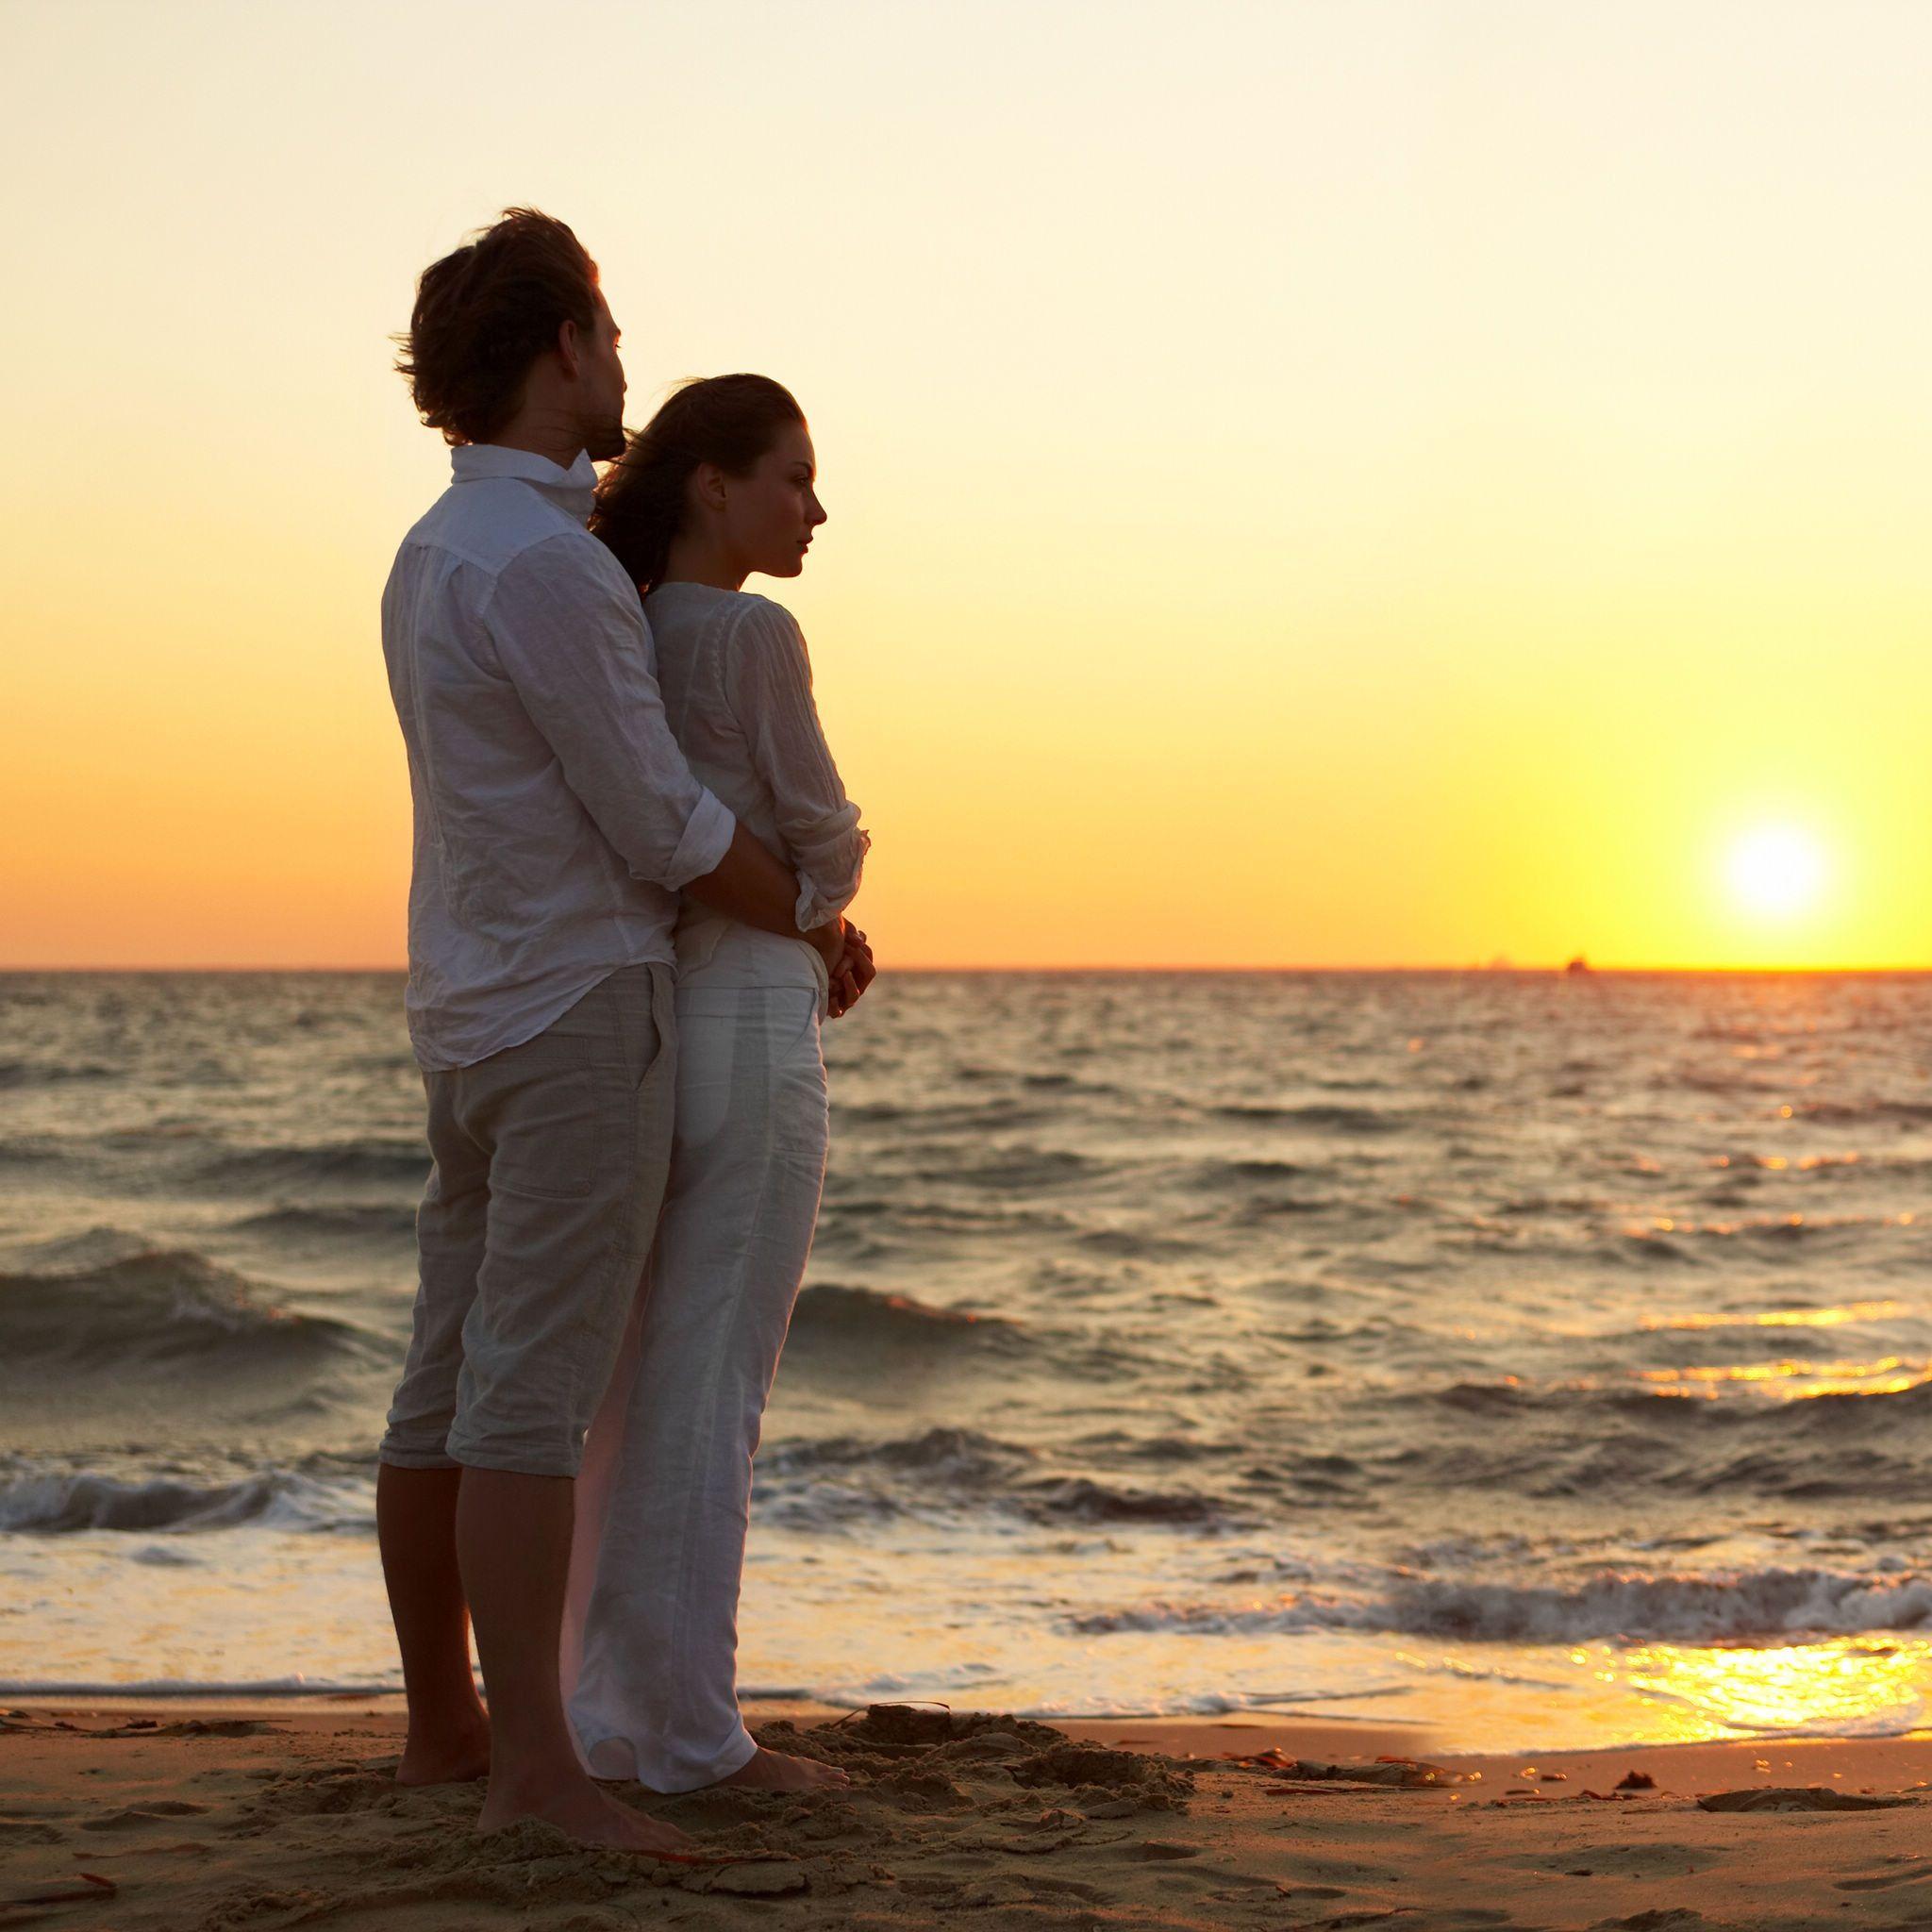 Romantic beach scene always a plus | Plot | Pinterest